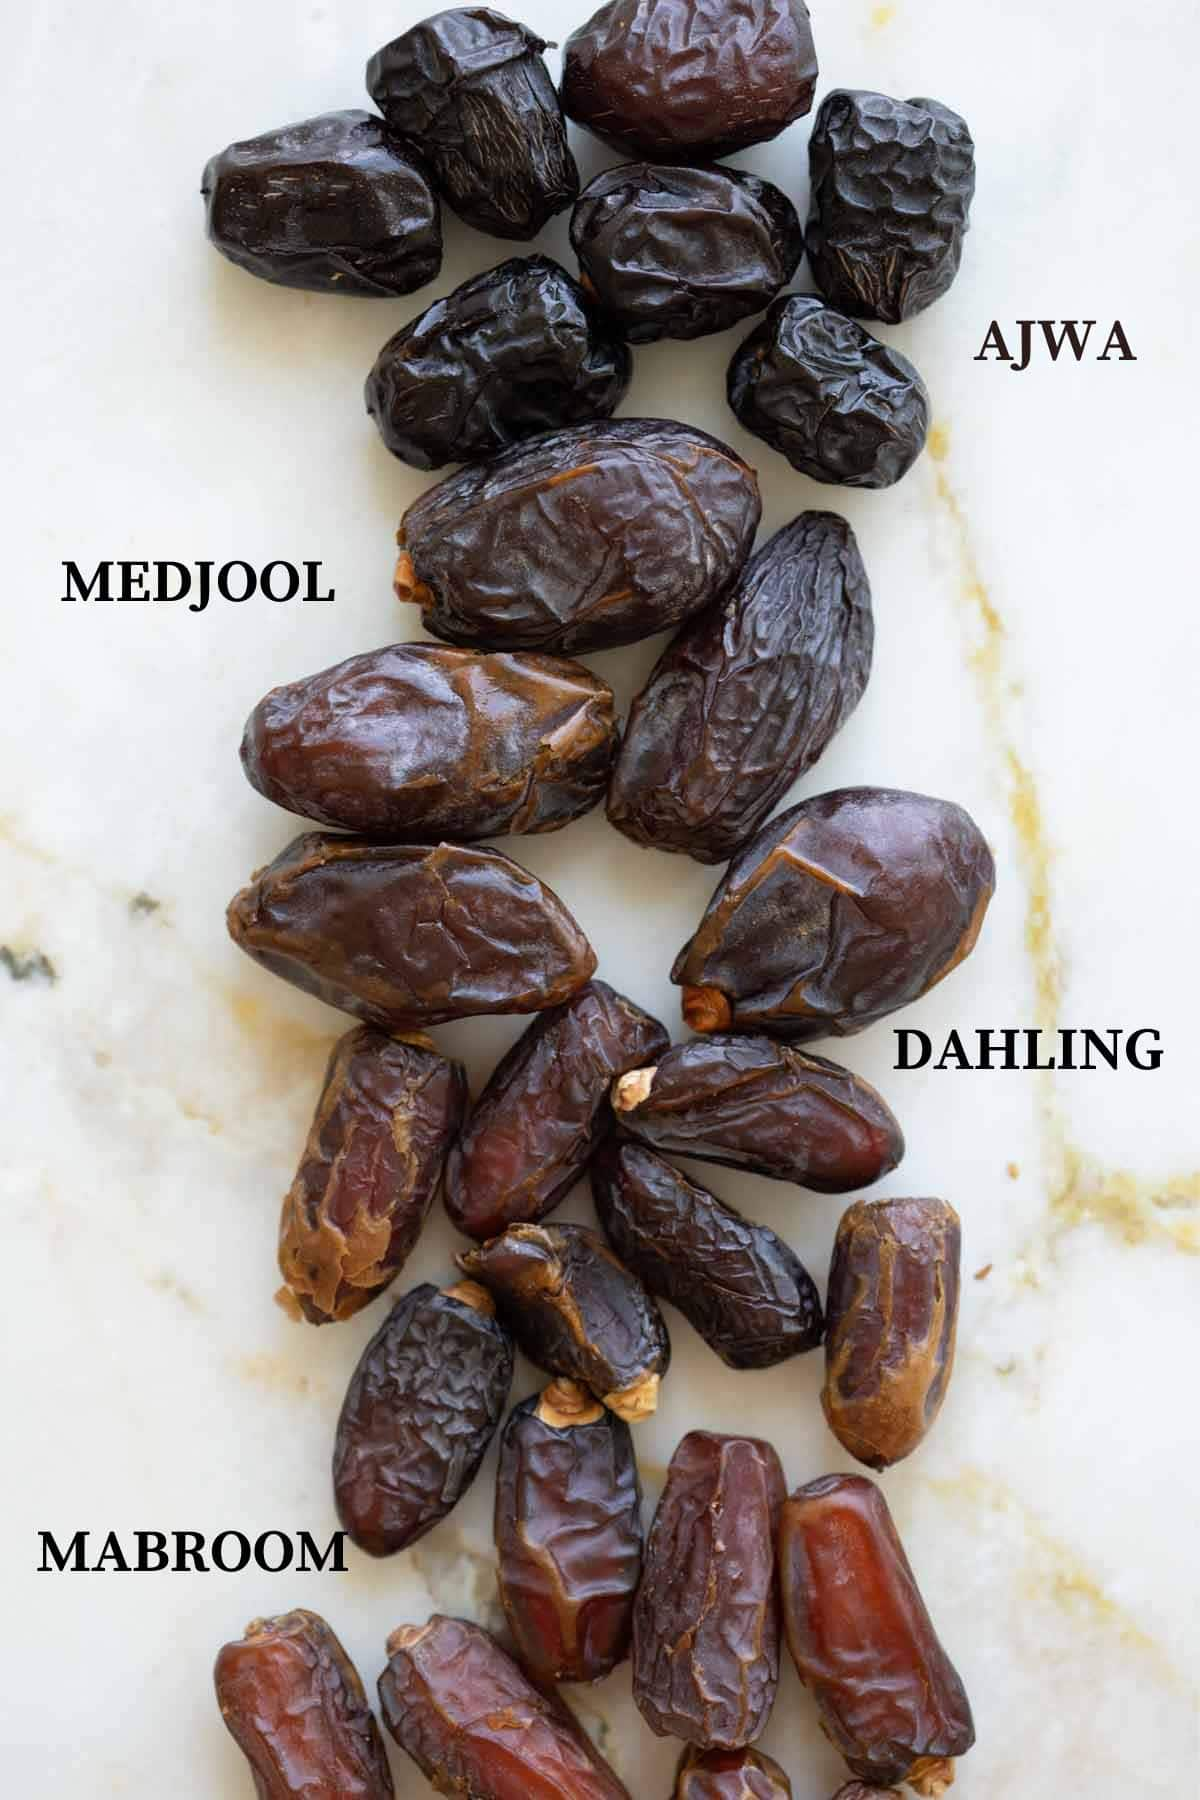 ajwa dates with medjool and mabroom